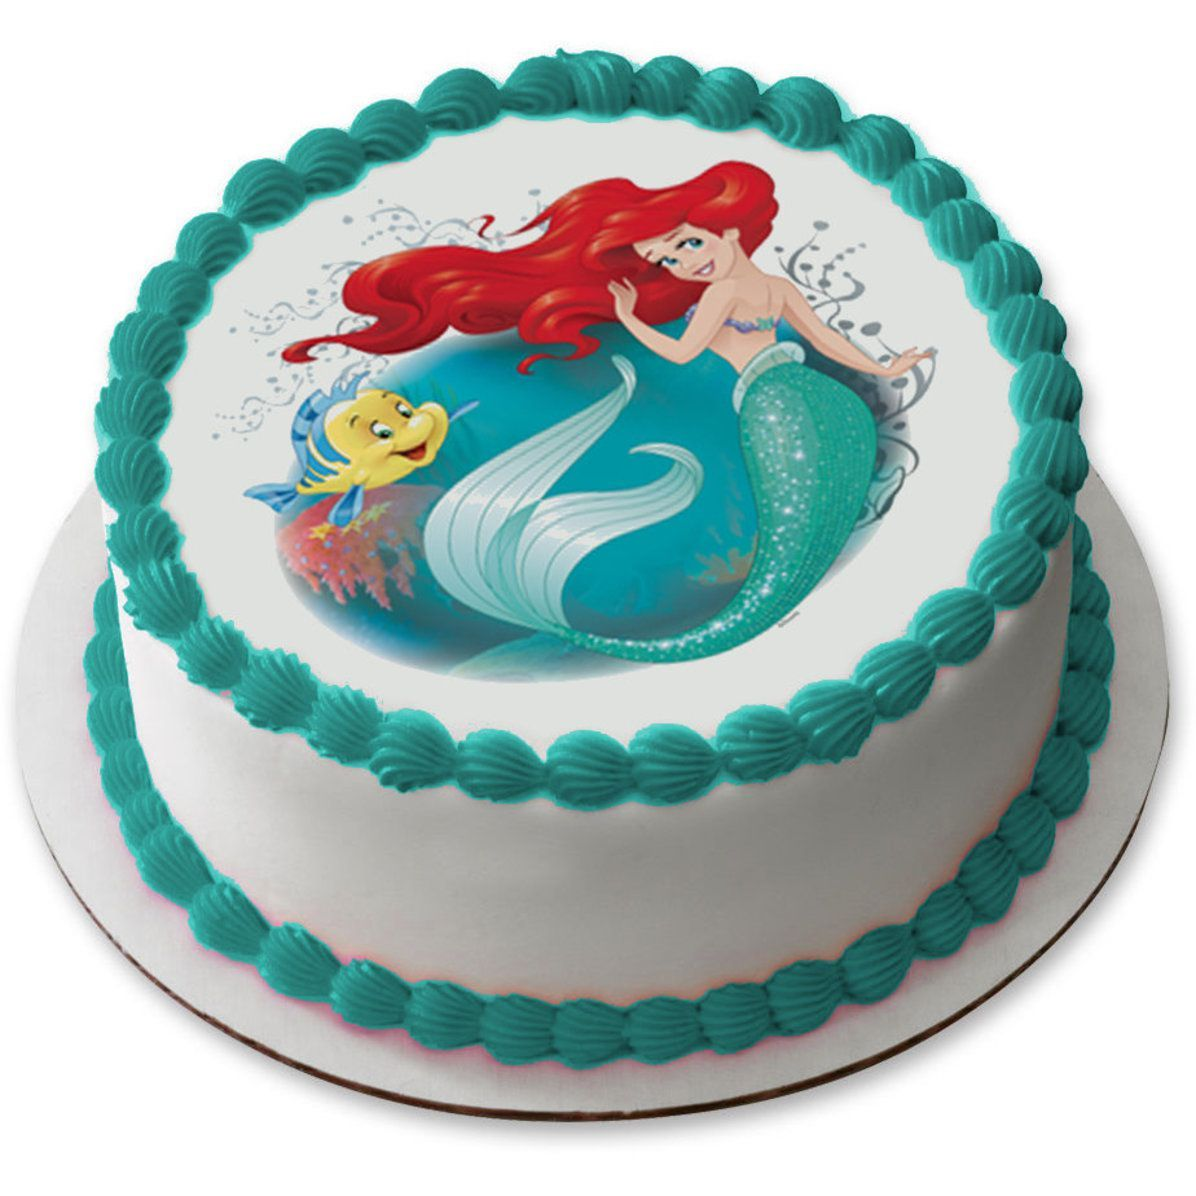 Русалочка ариэль картинка для торта